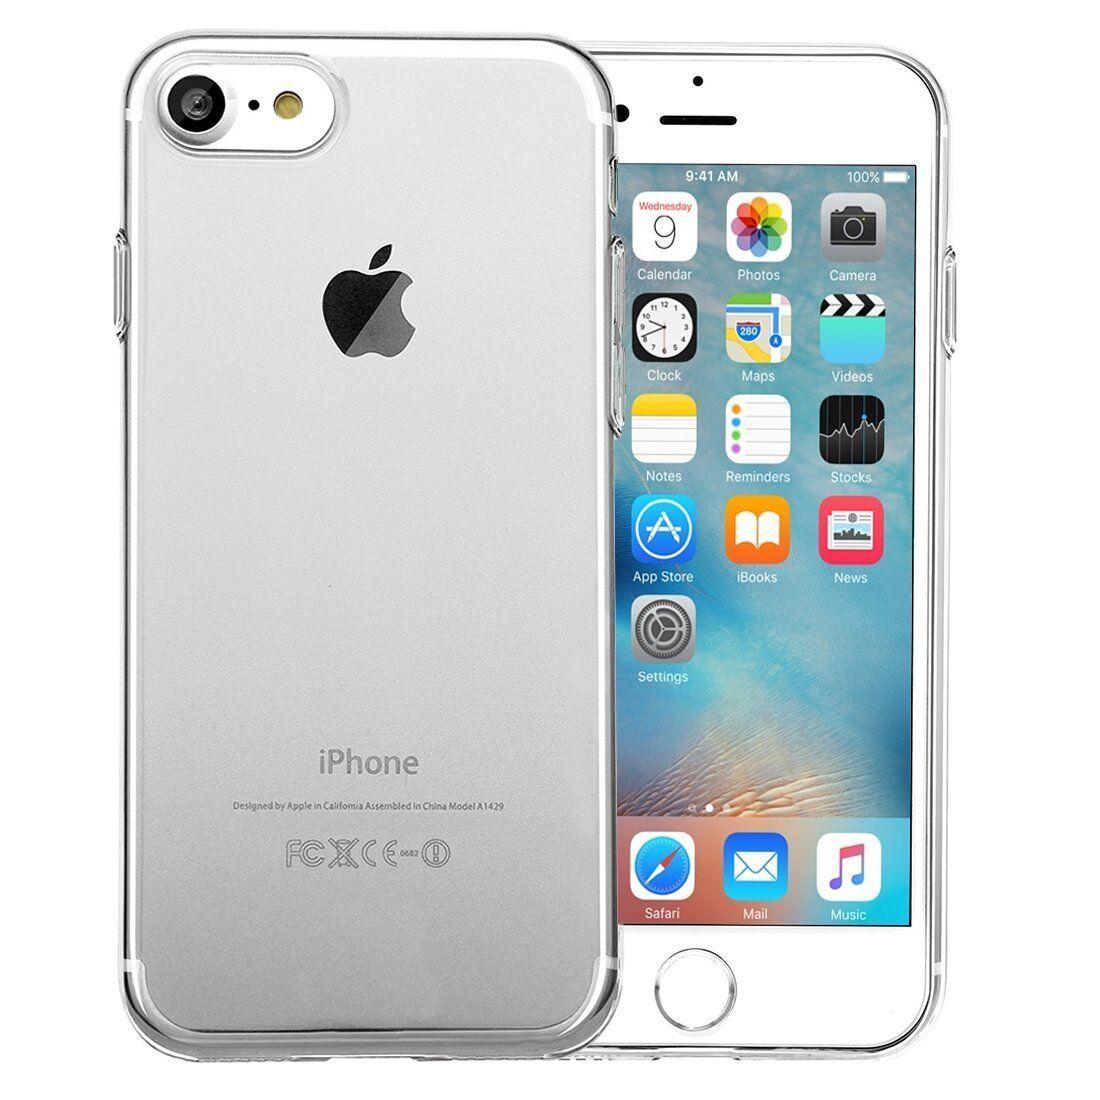 Apple iPhone 6S Hülle / 6 Hülle Silikon Transparent Handyhülle Case Bumper Cover